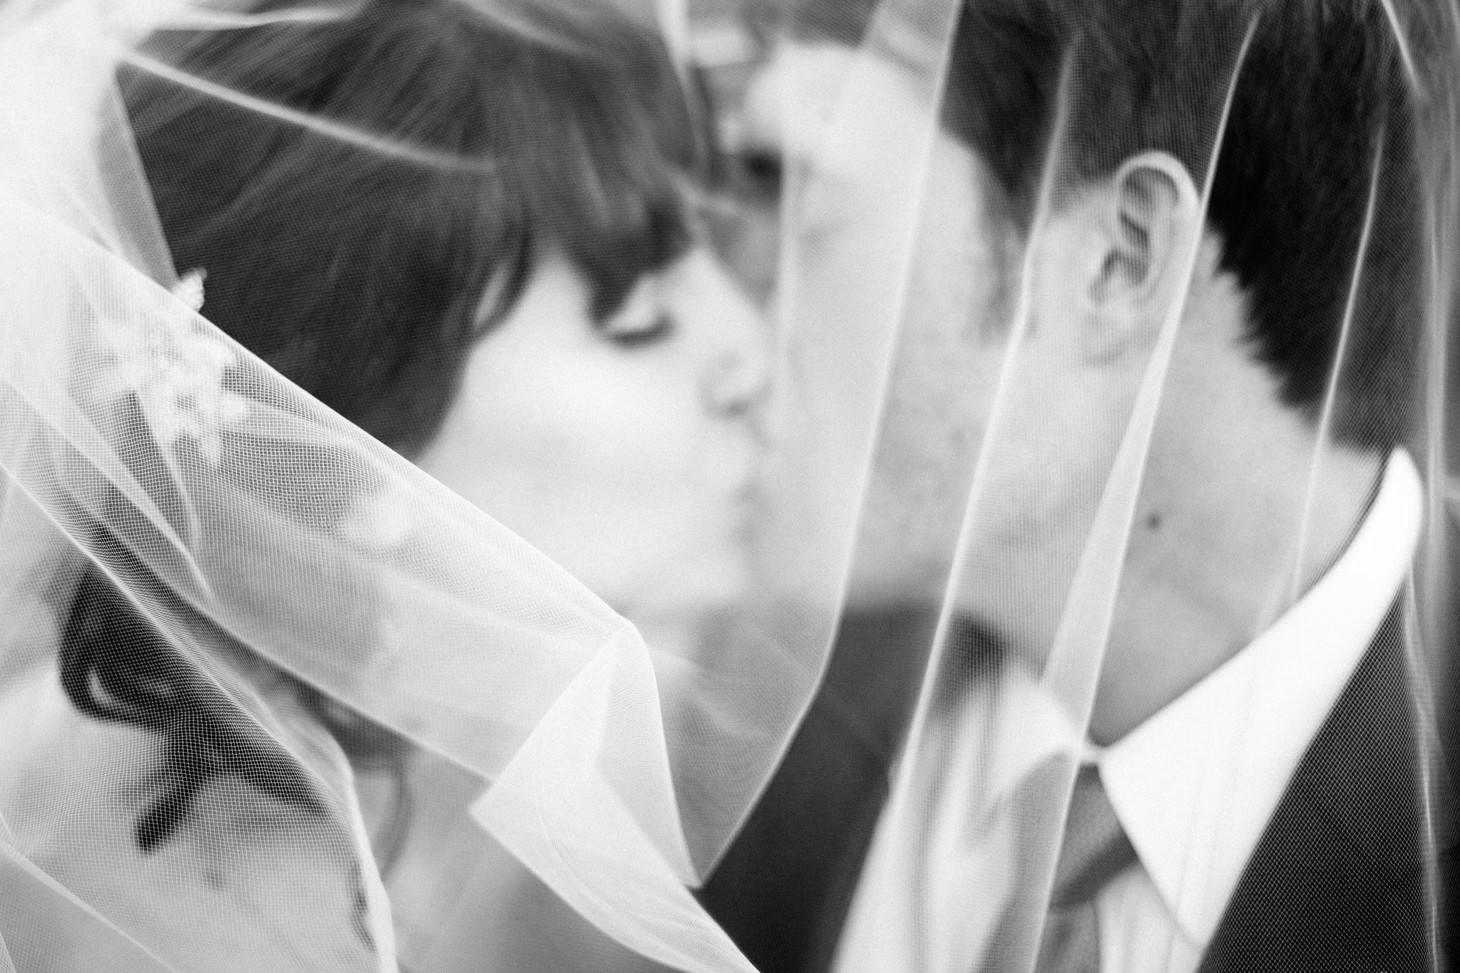 088-nyc-wedding-photographer-smitten-chickens-nj-morris-art-museum.jpg